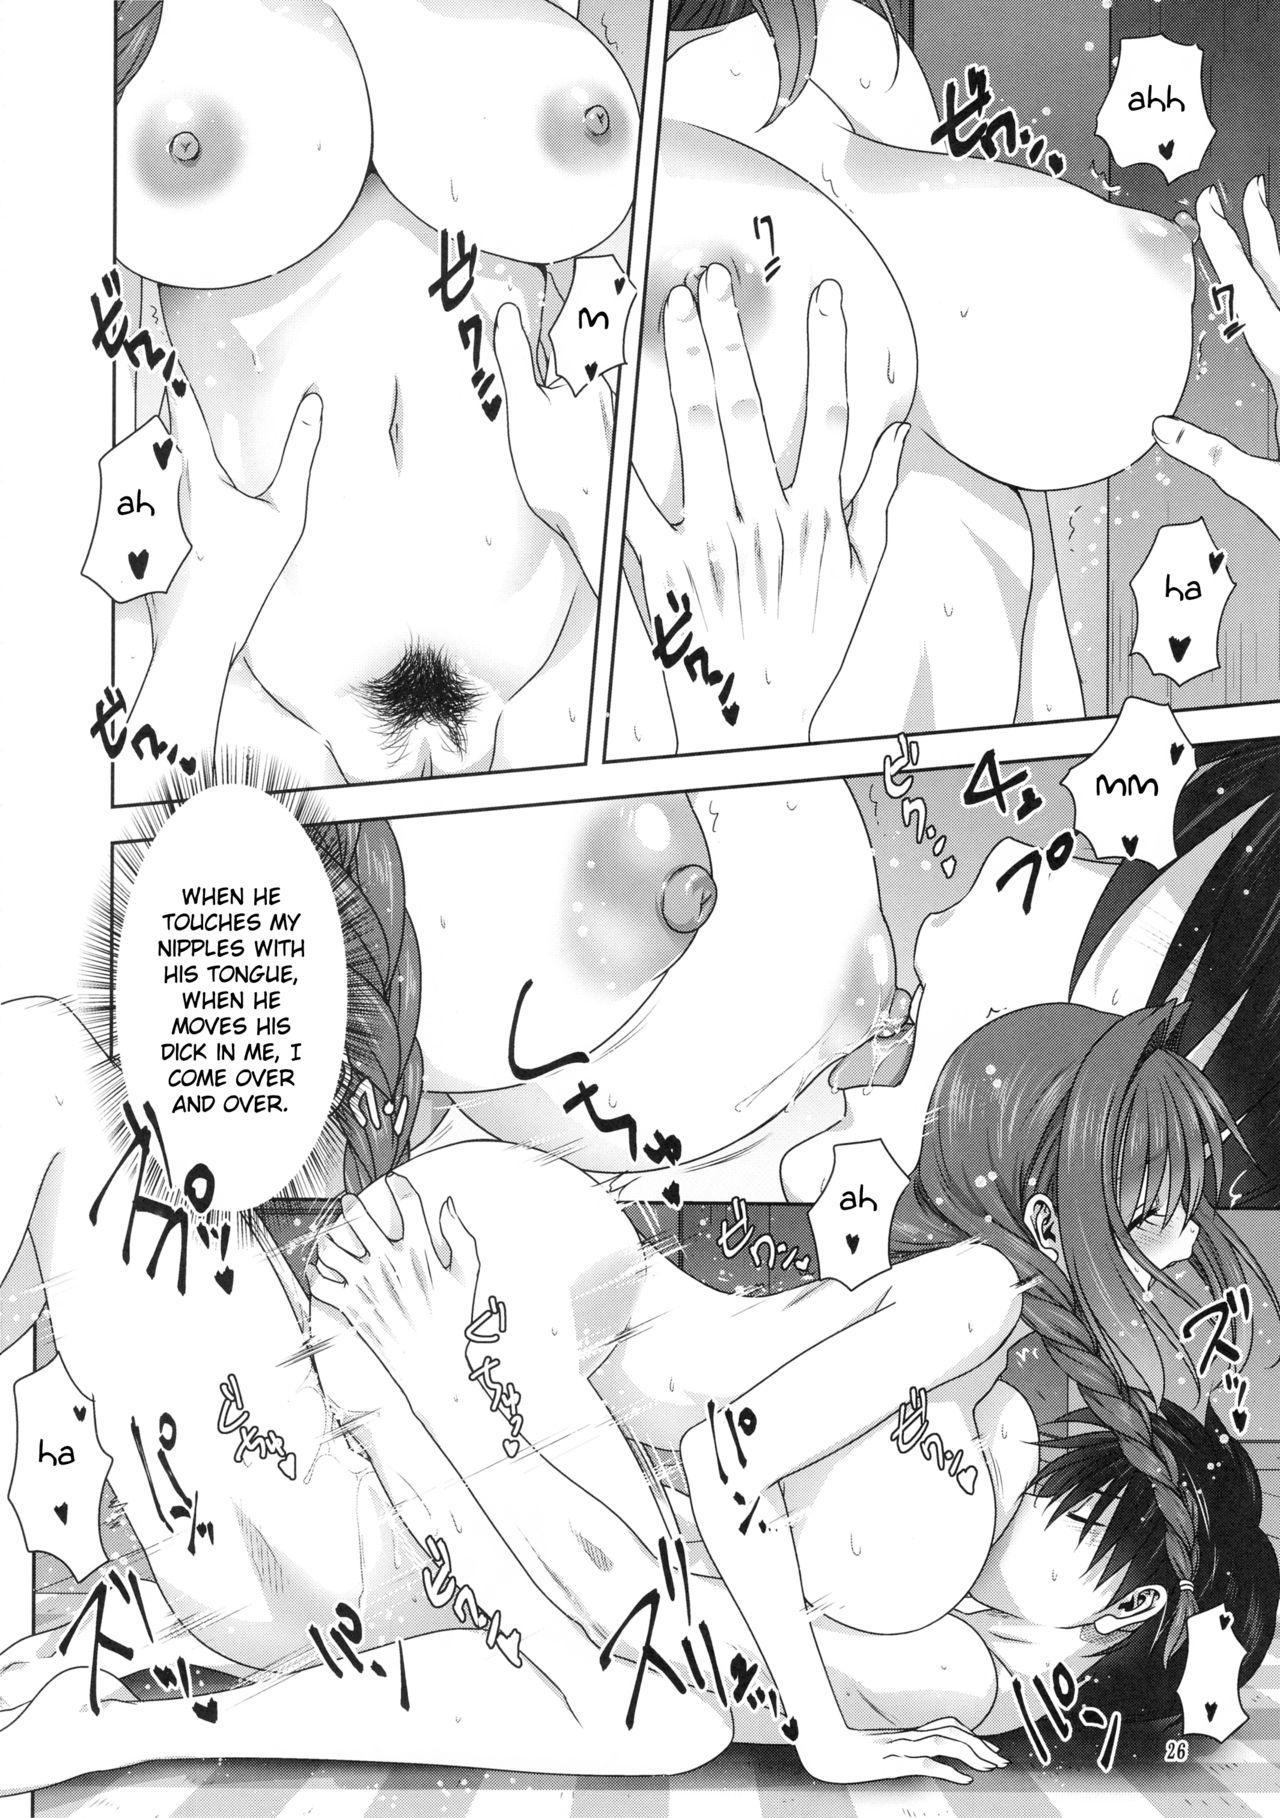 Akiko-san to Issho 23 24